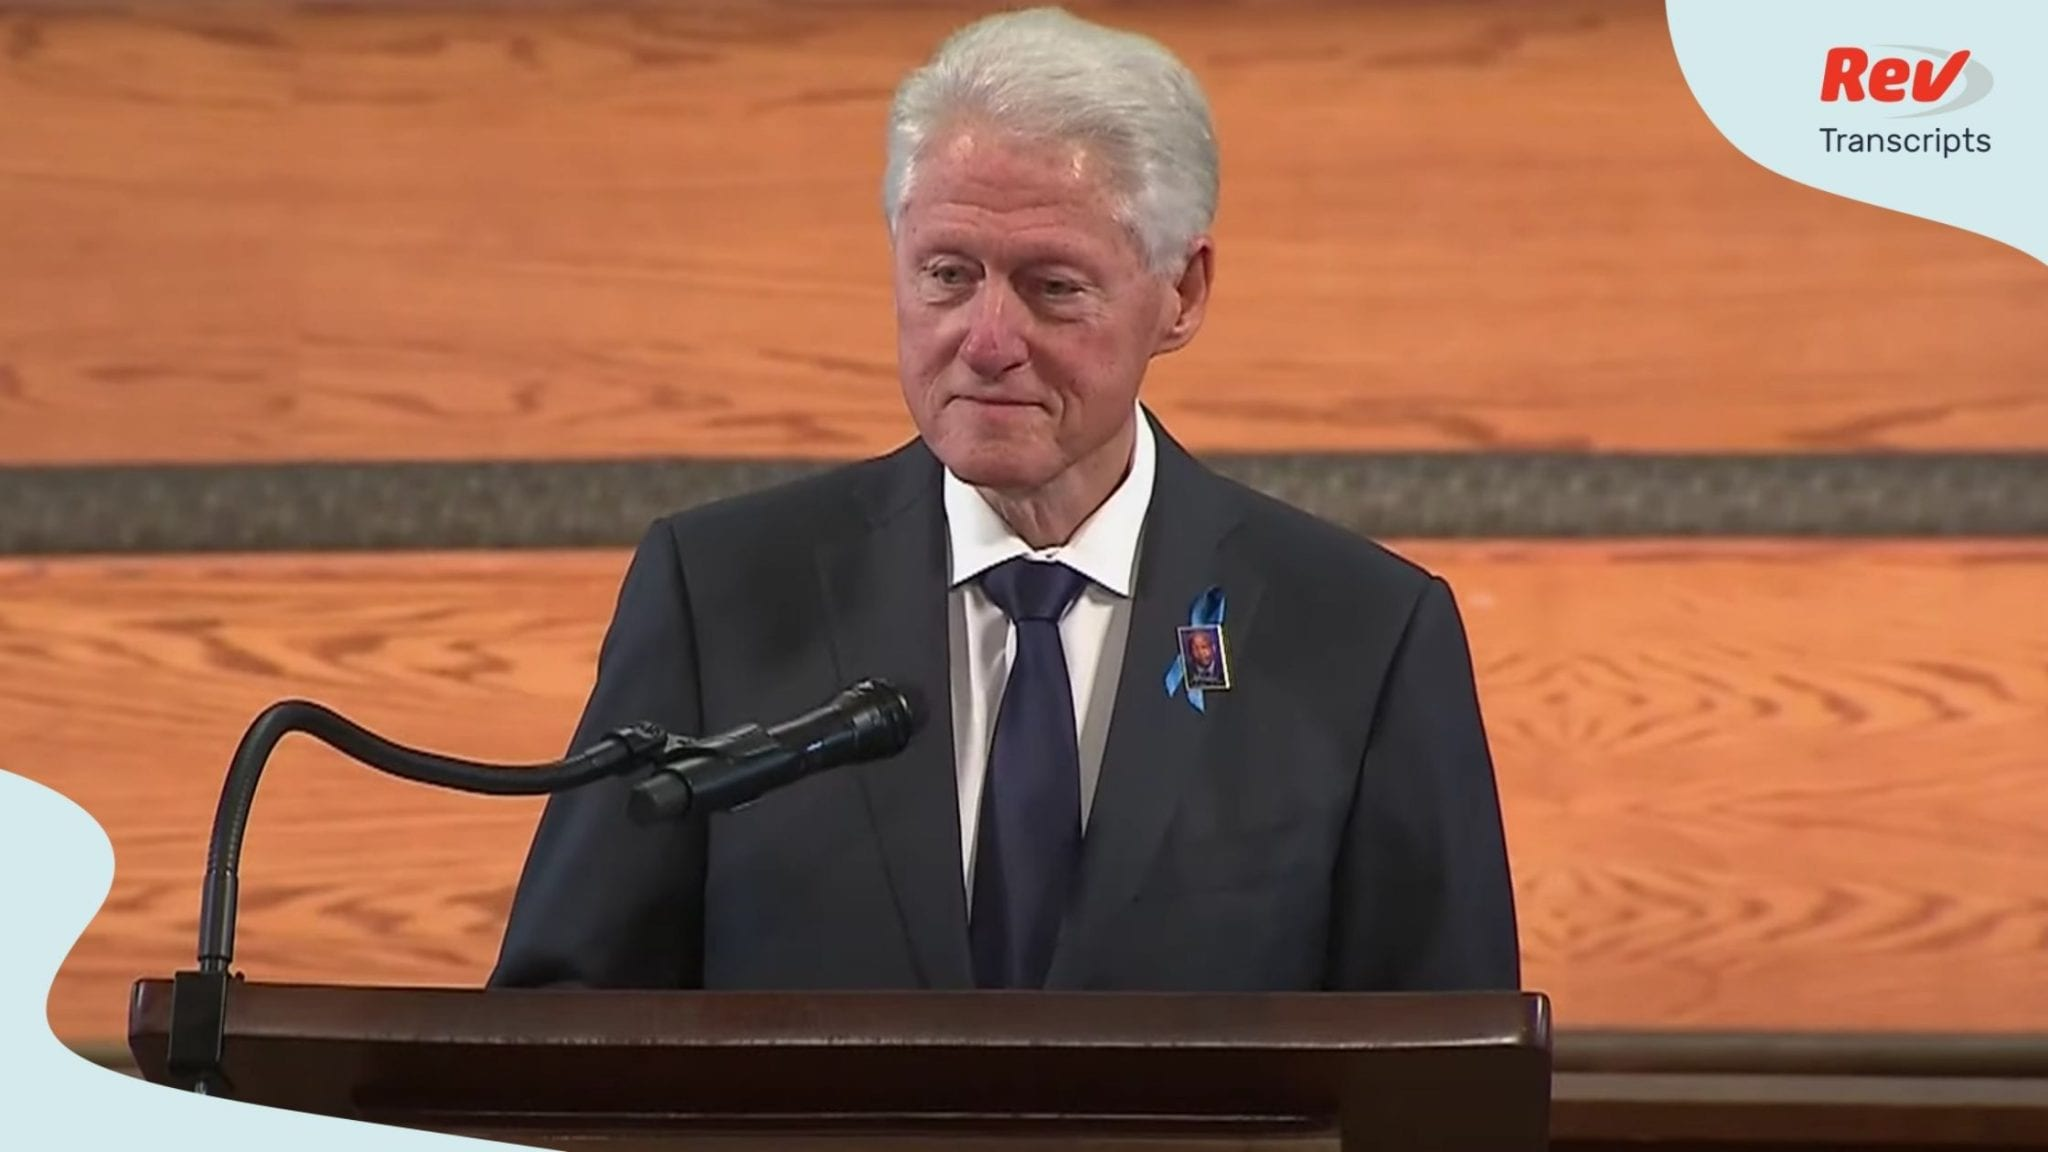 Bill Clinton Eulogy Transcript at John Lewis Funeral July 30